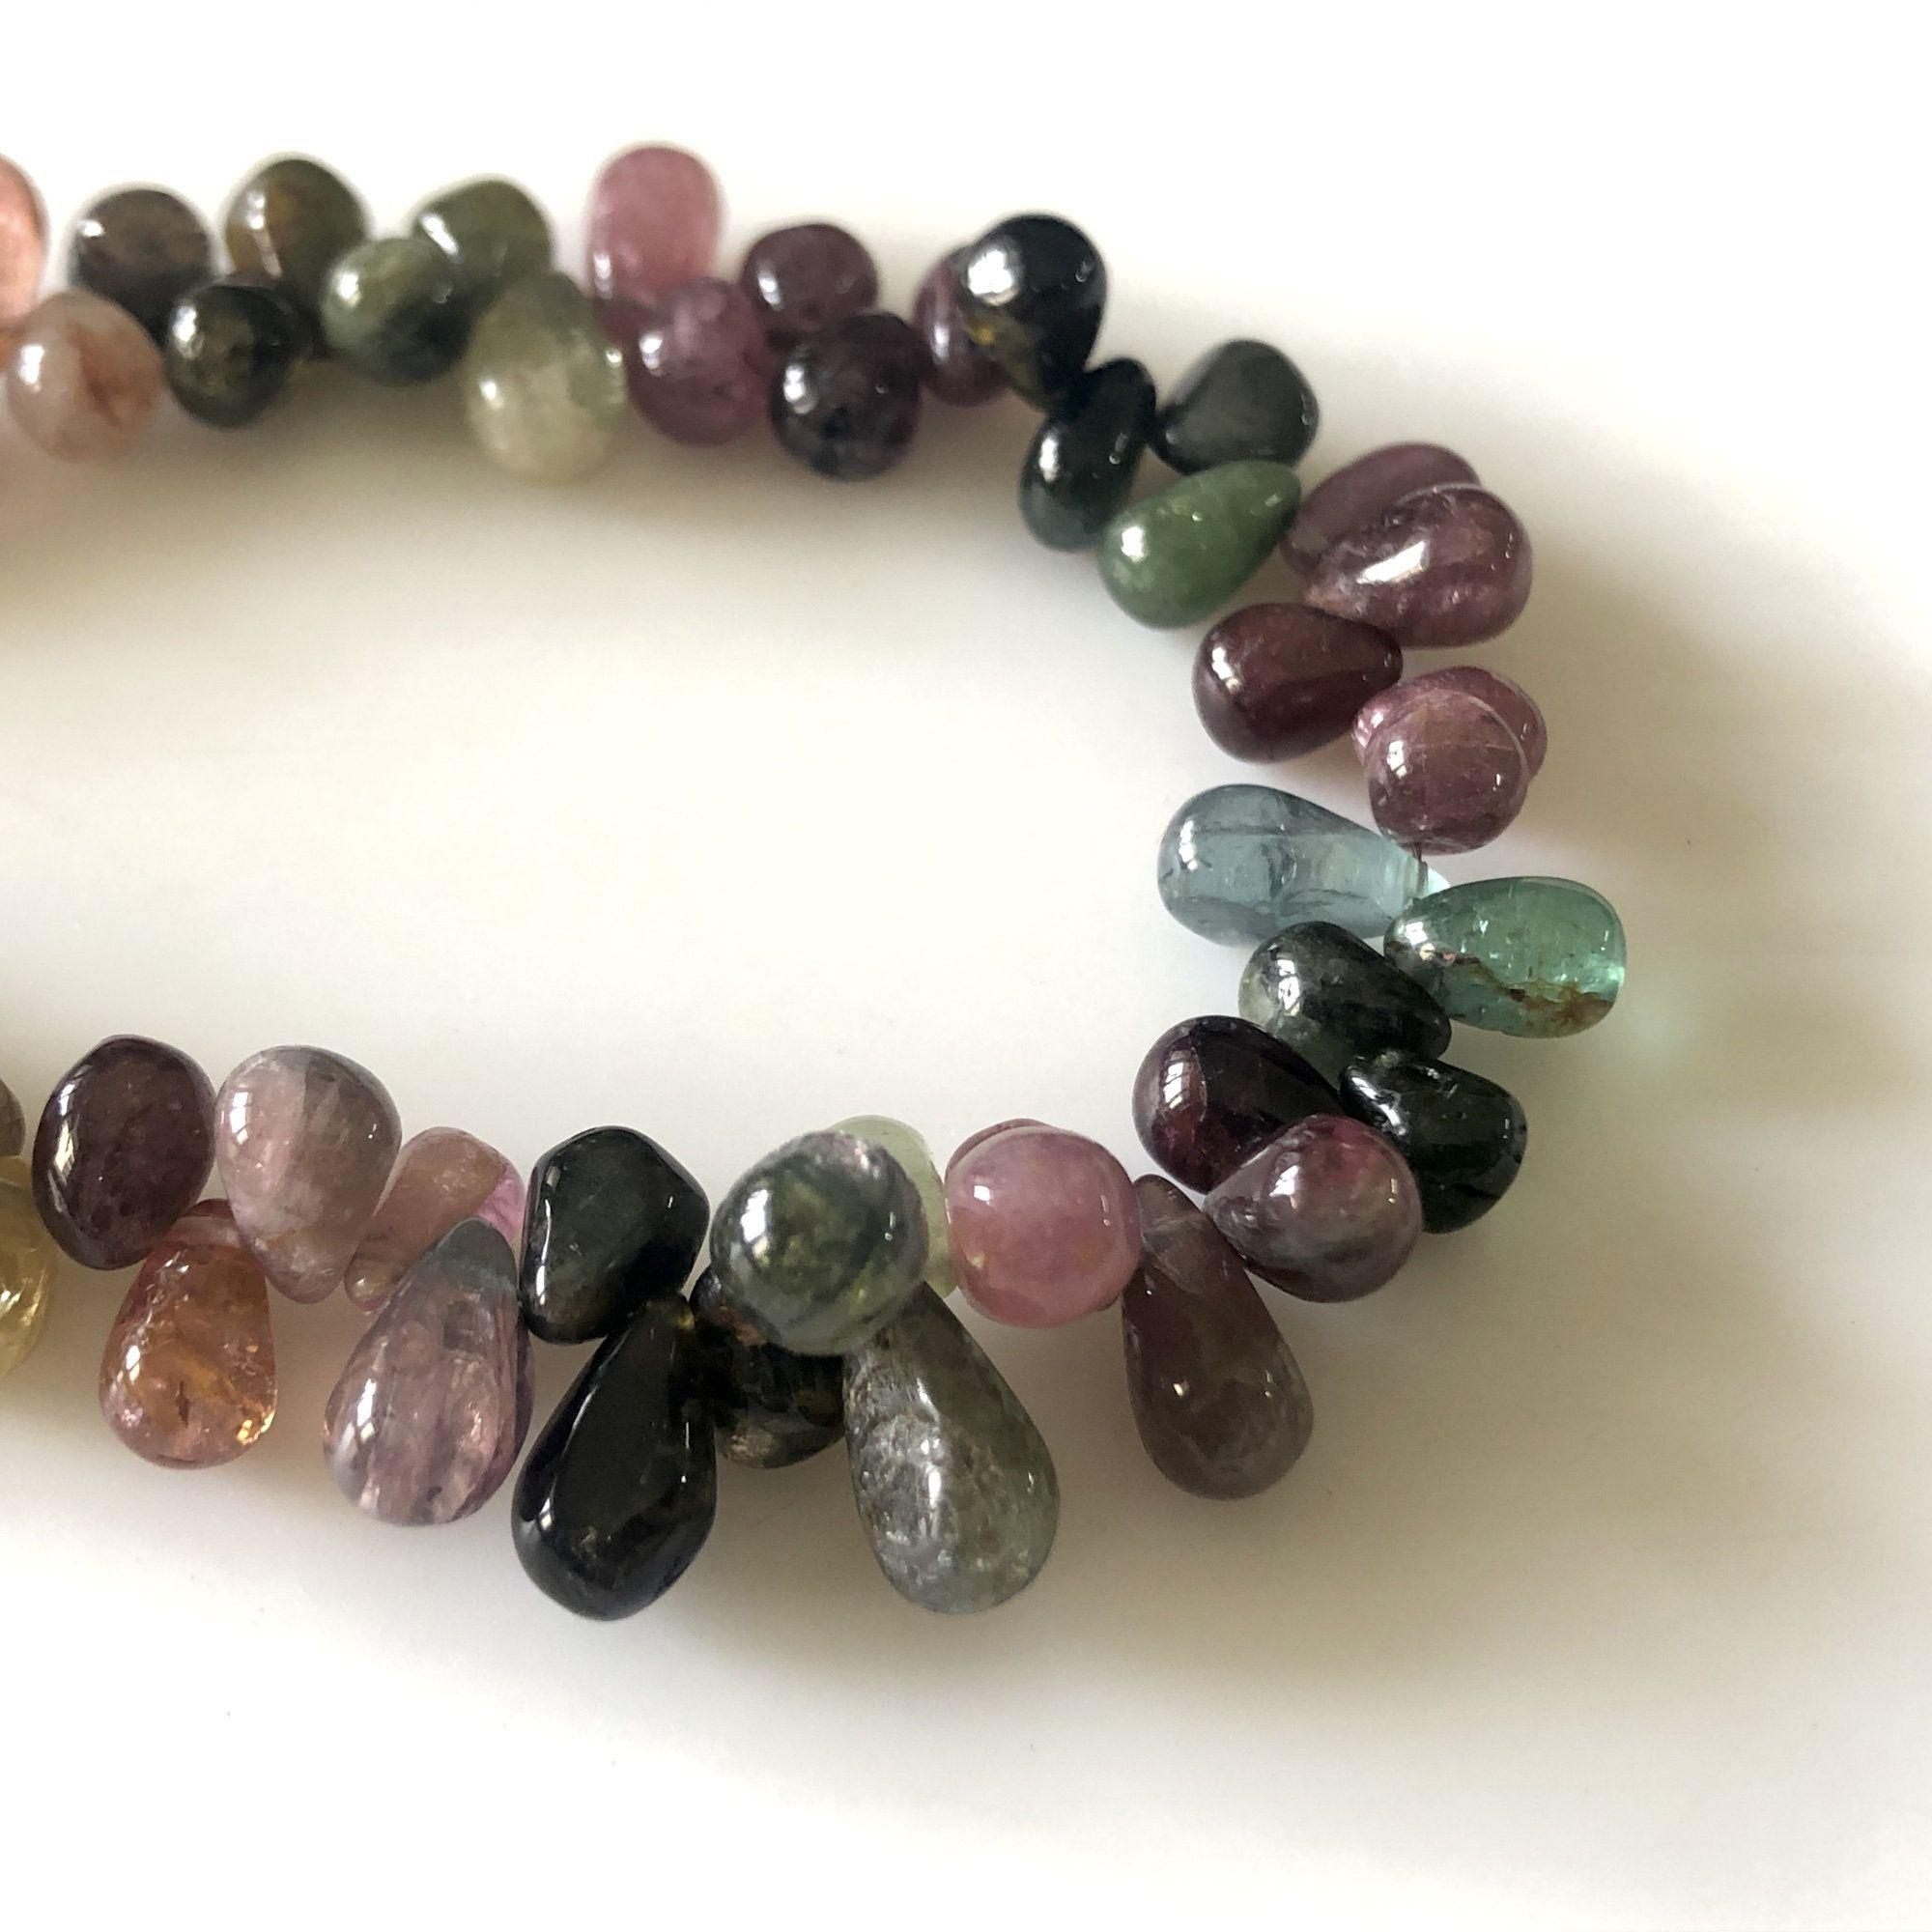 Natural Gem Multi-color Fluorite Faceted 8MM Heart Shape Briolette Beads 8 Inch